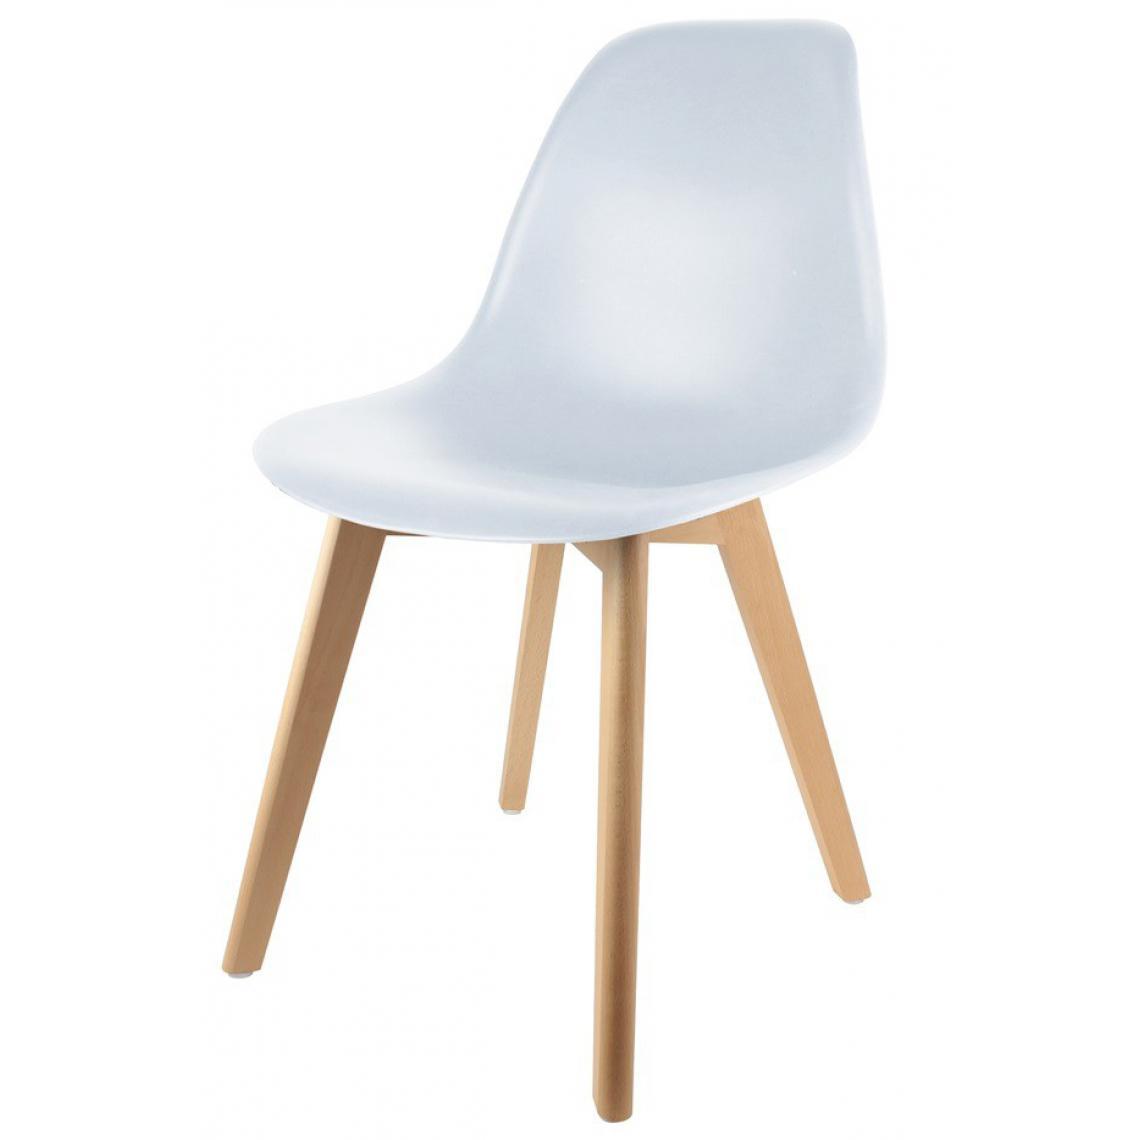 chaise enfant scandinave blanc baby fjord 3suisses. Black Bedroom Furniture Sets. Home Design Ideas